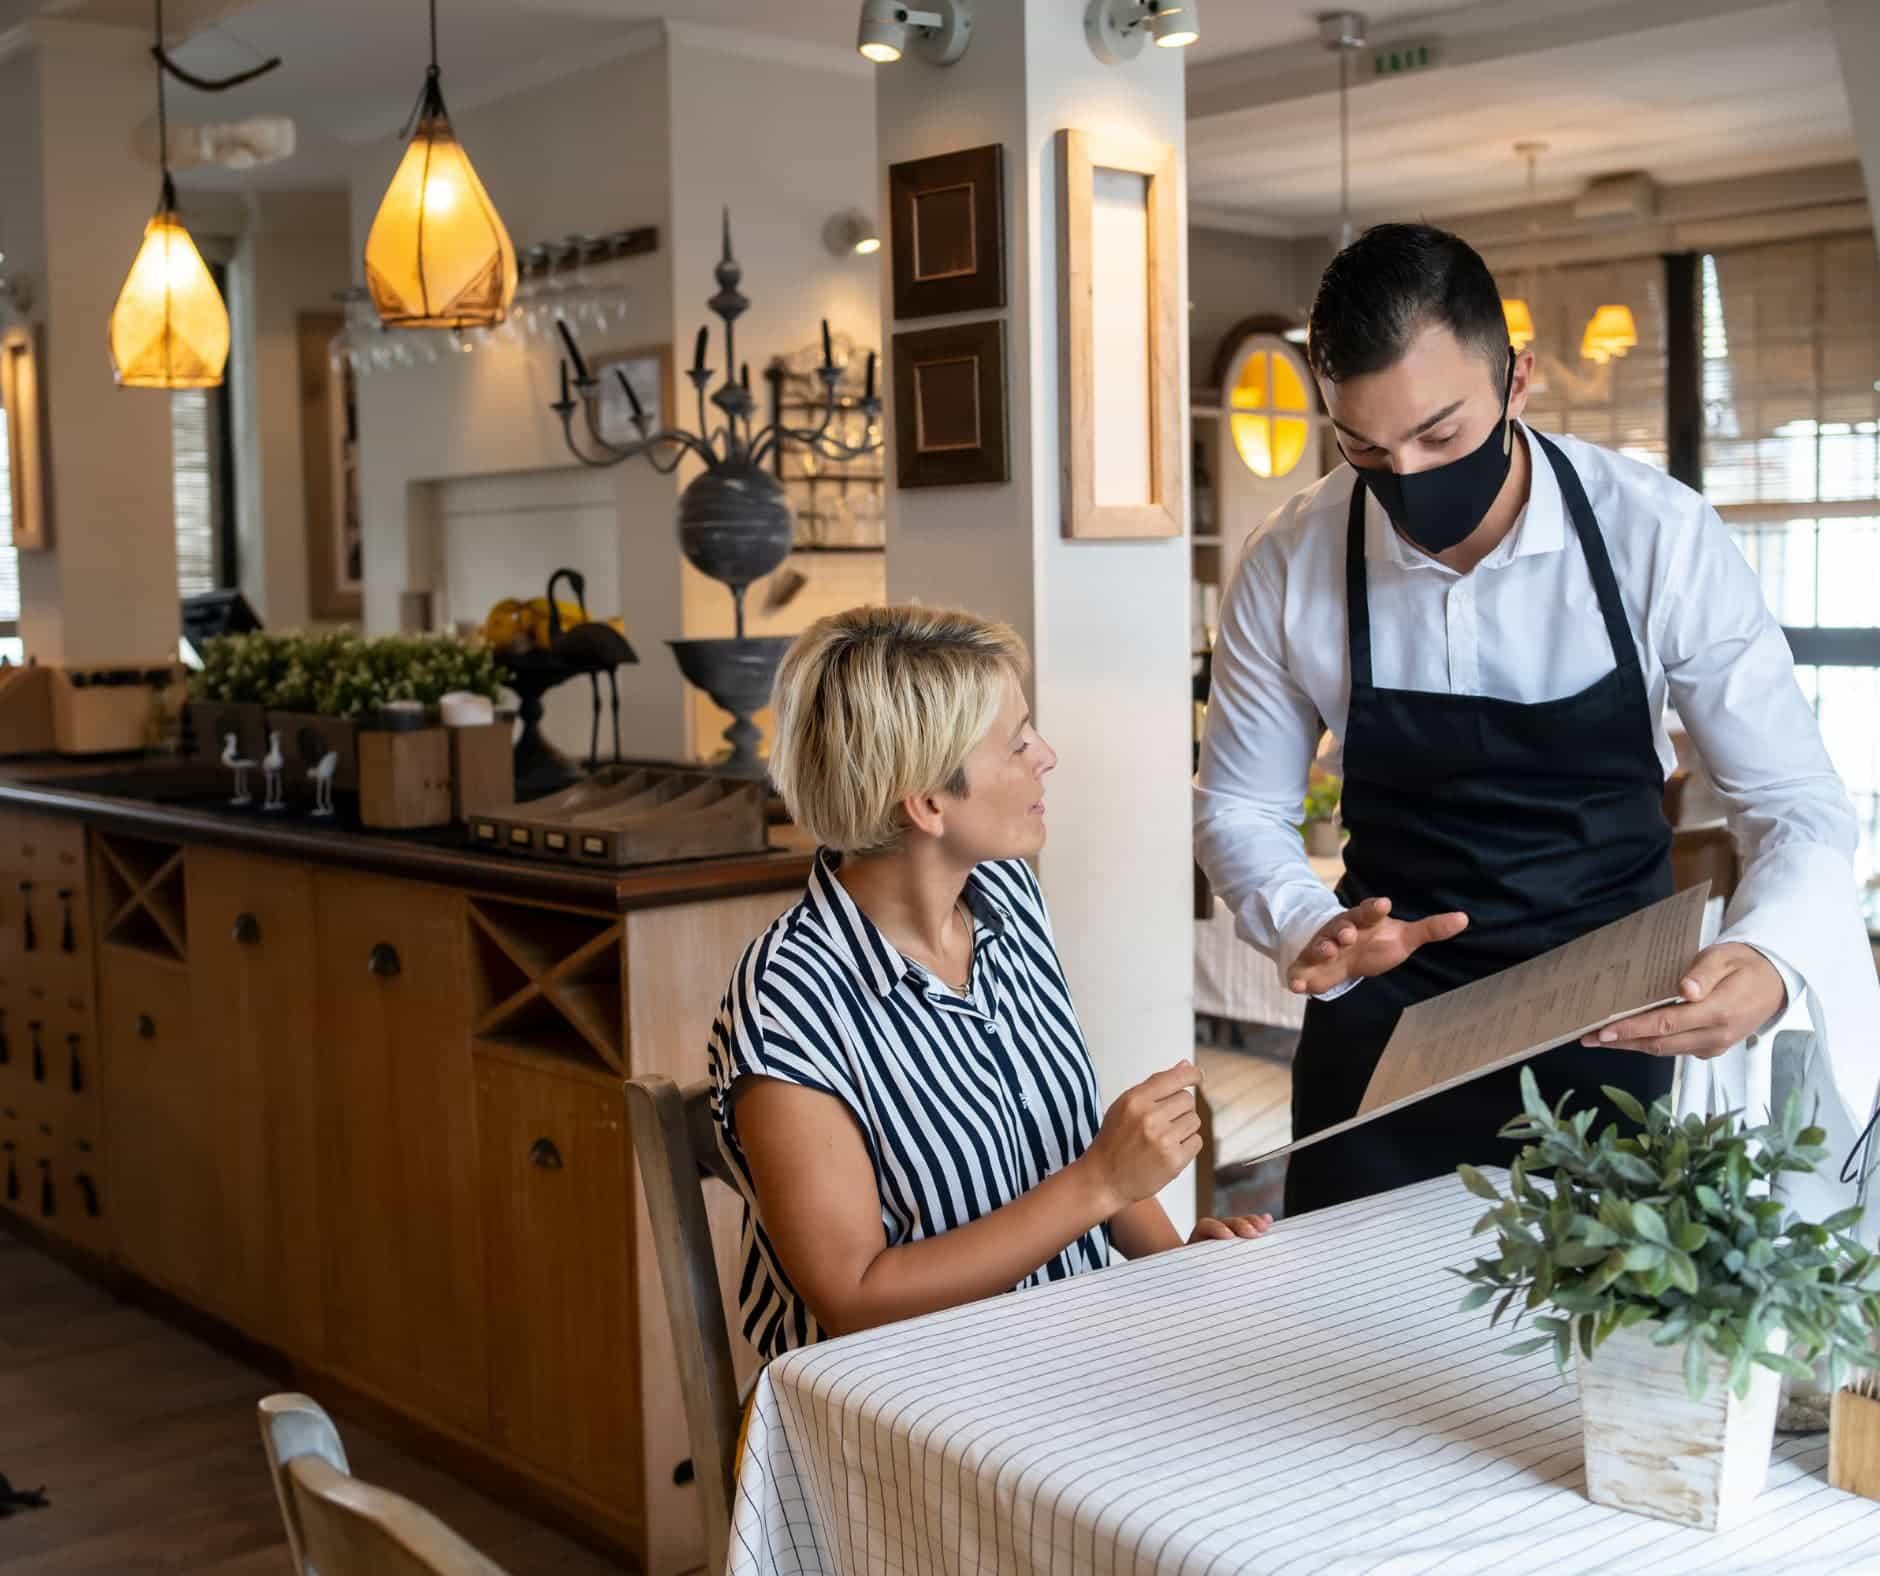 recensioni online ristoranti